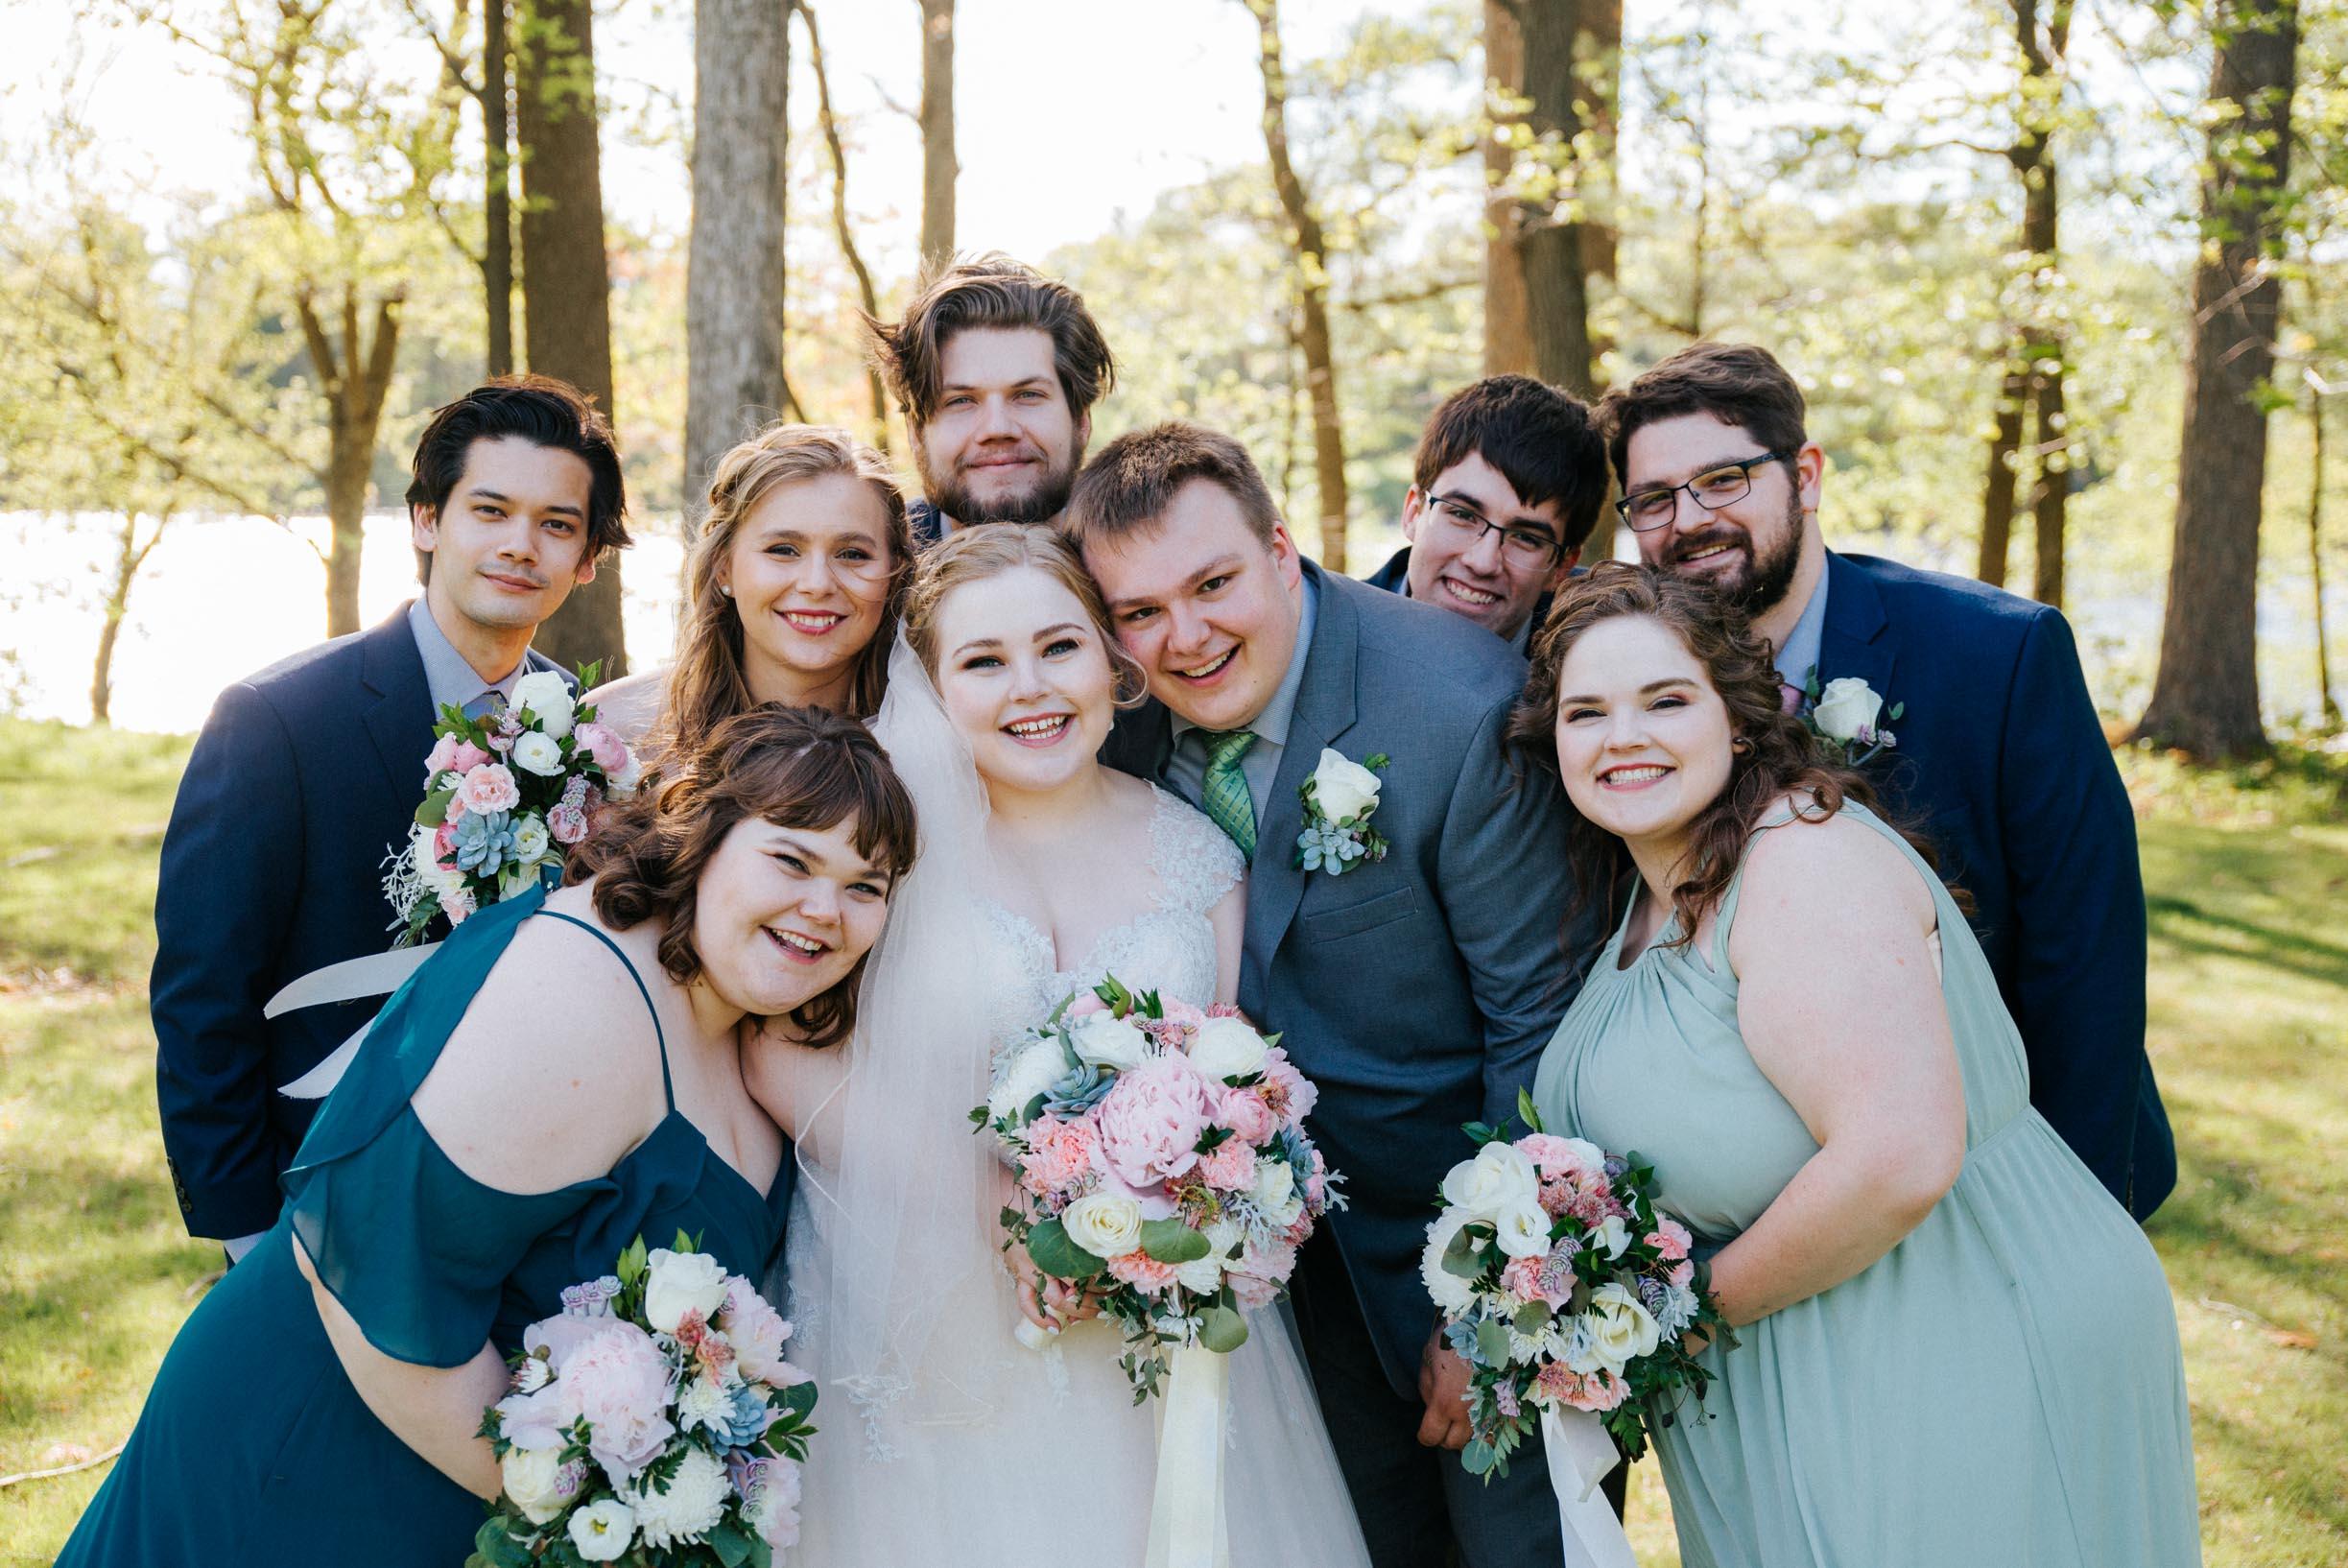 Hannah_Brandon_Wisconsin_Wedding_Party_Portraits-29.jpg